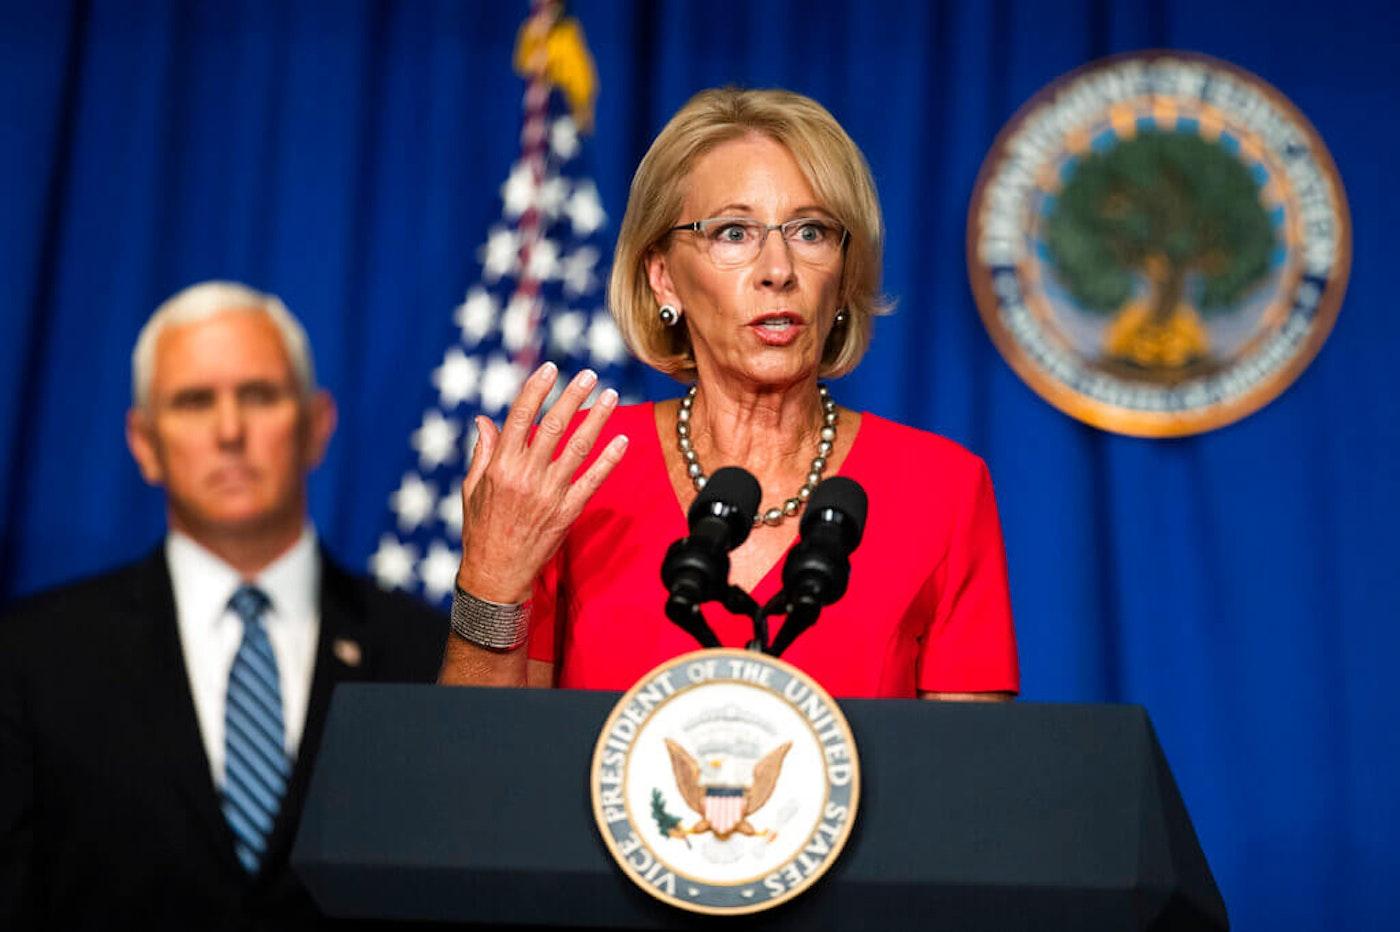 Education Secretary Betsy DeVos, with Vice President Mike Pence. (AP Photo/Manuel Balce Ceneta)